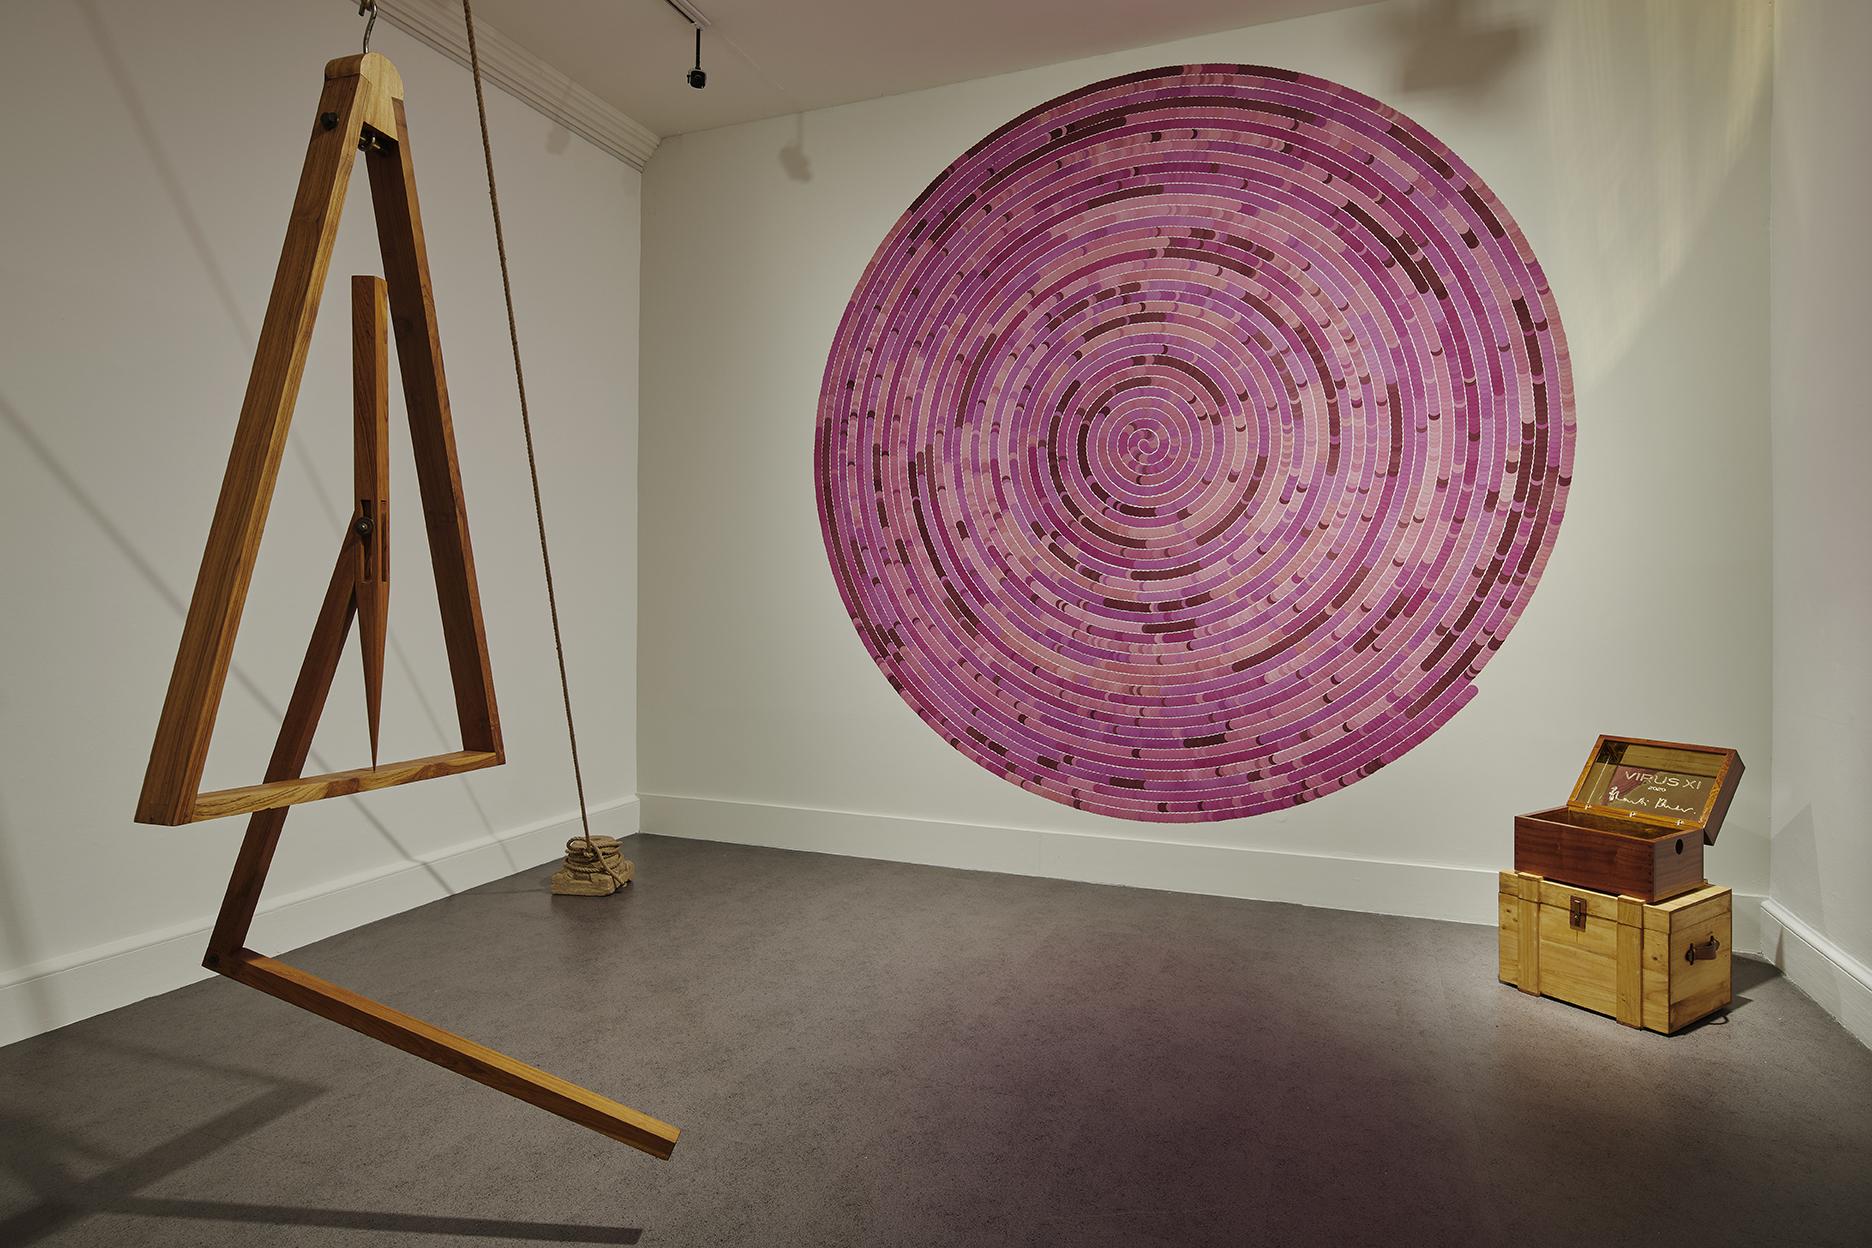 Installation view of A Consummate Joy by Bharti Kher. Photos Ros Kavanagh